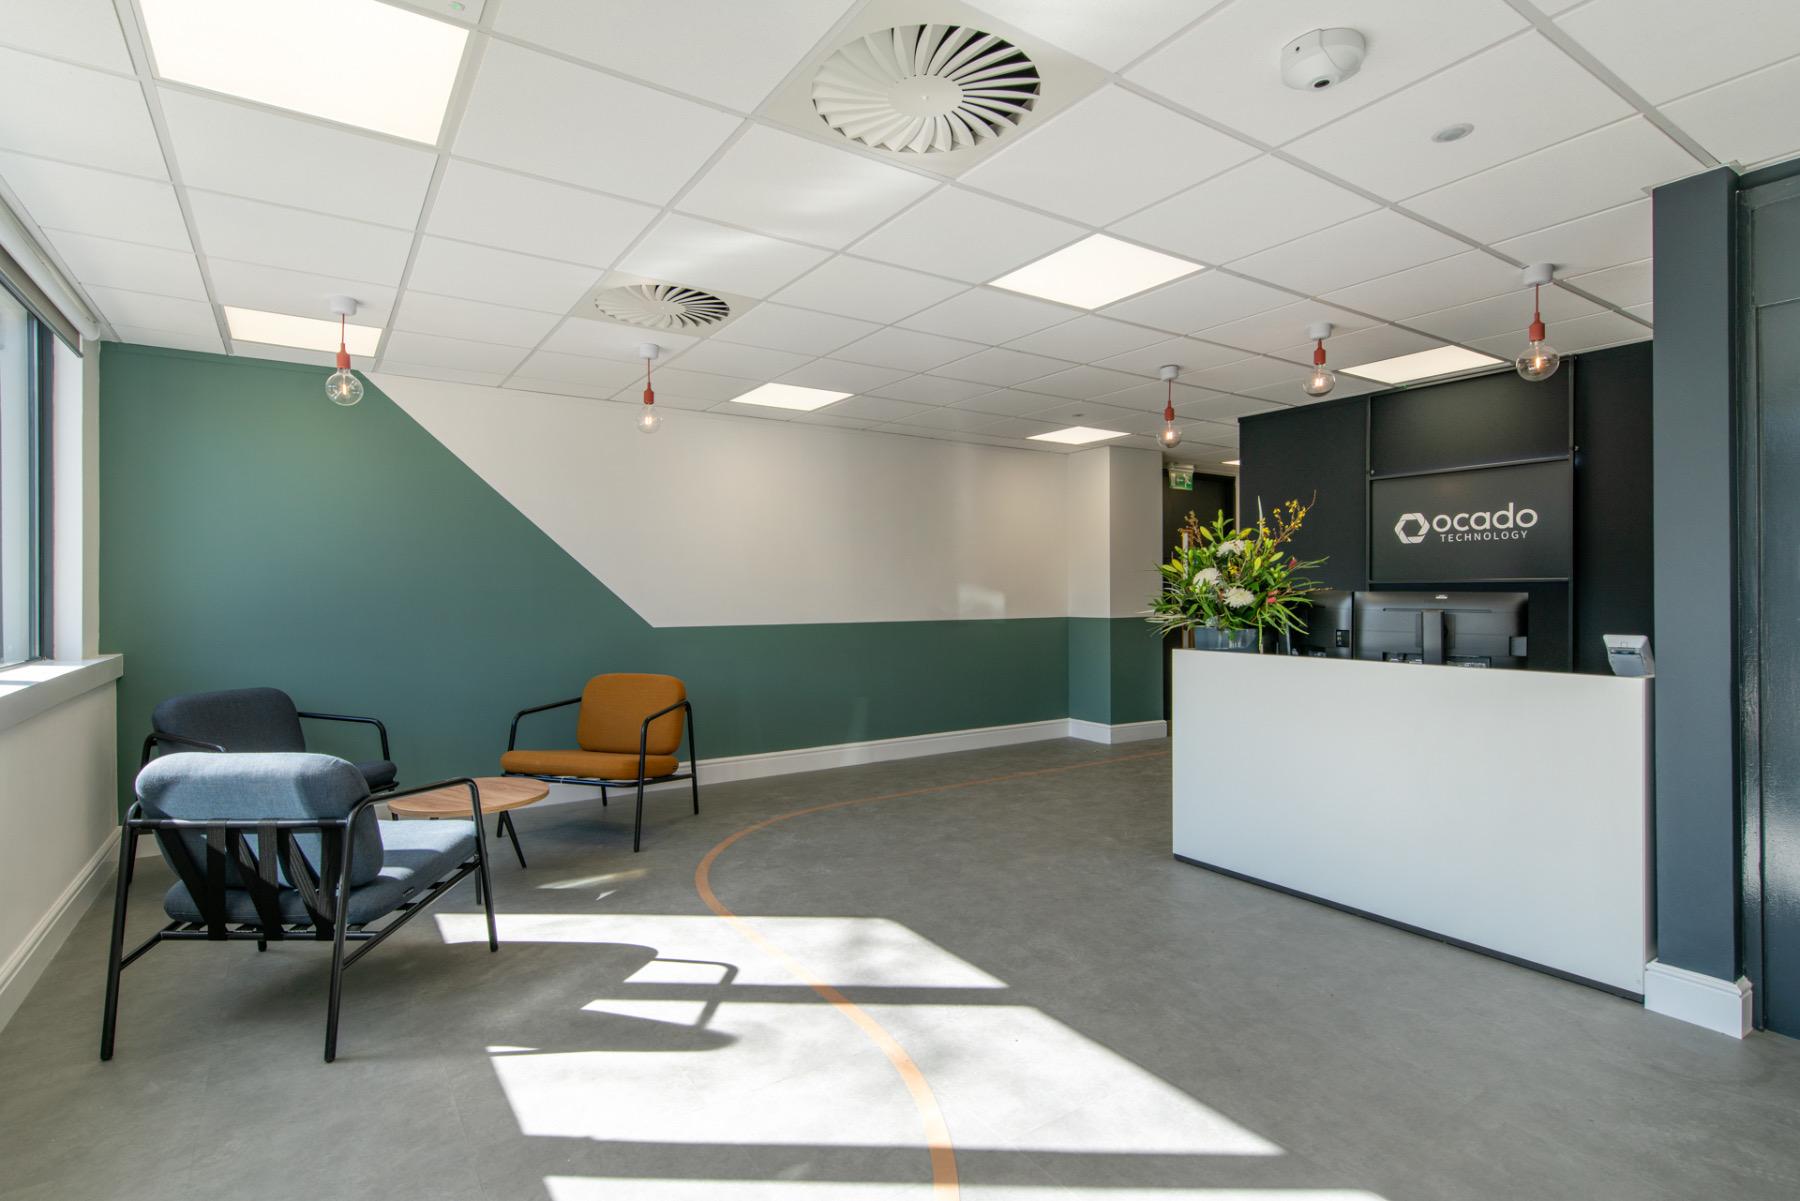 ocado-technology-office-5